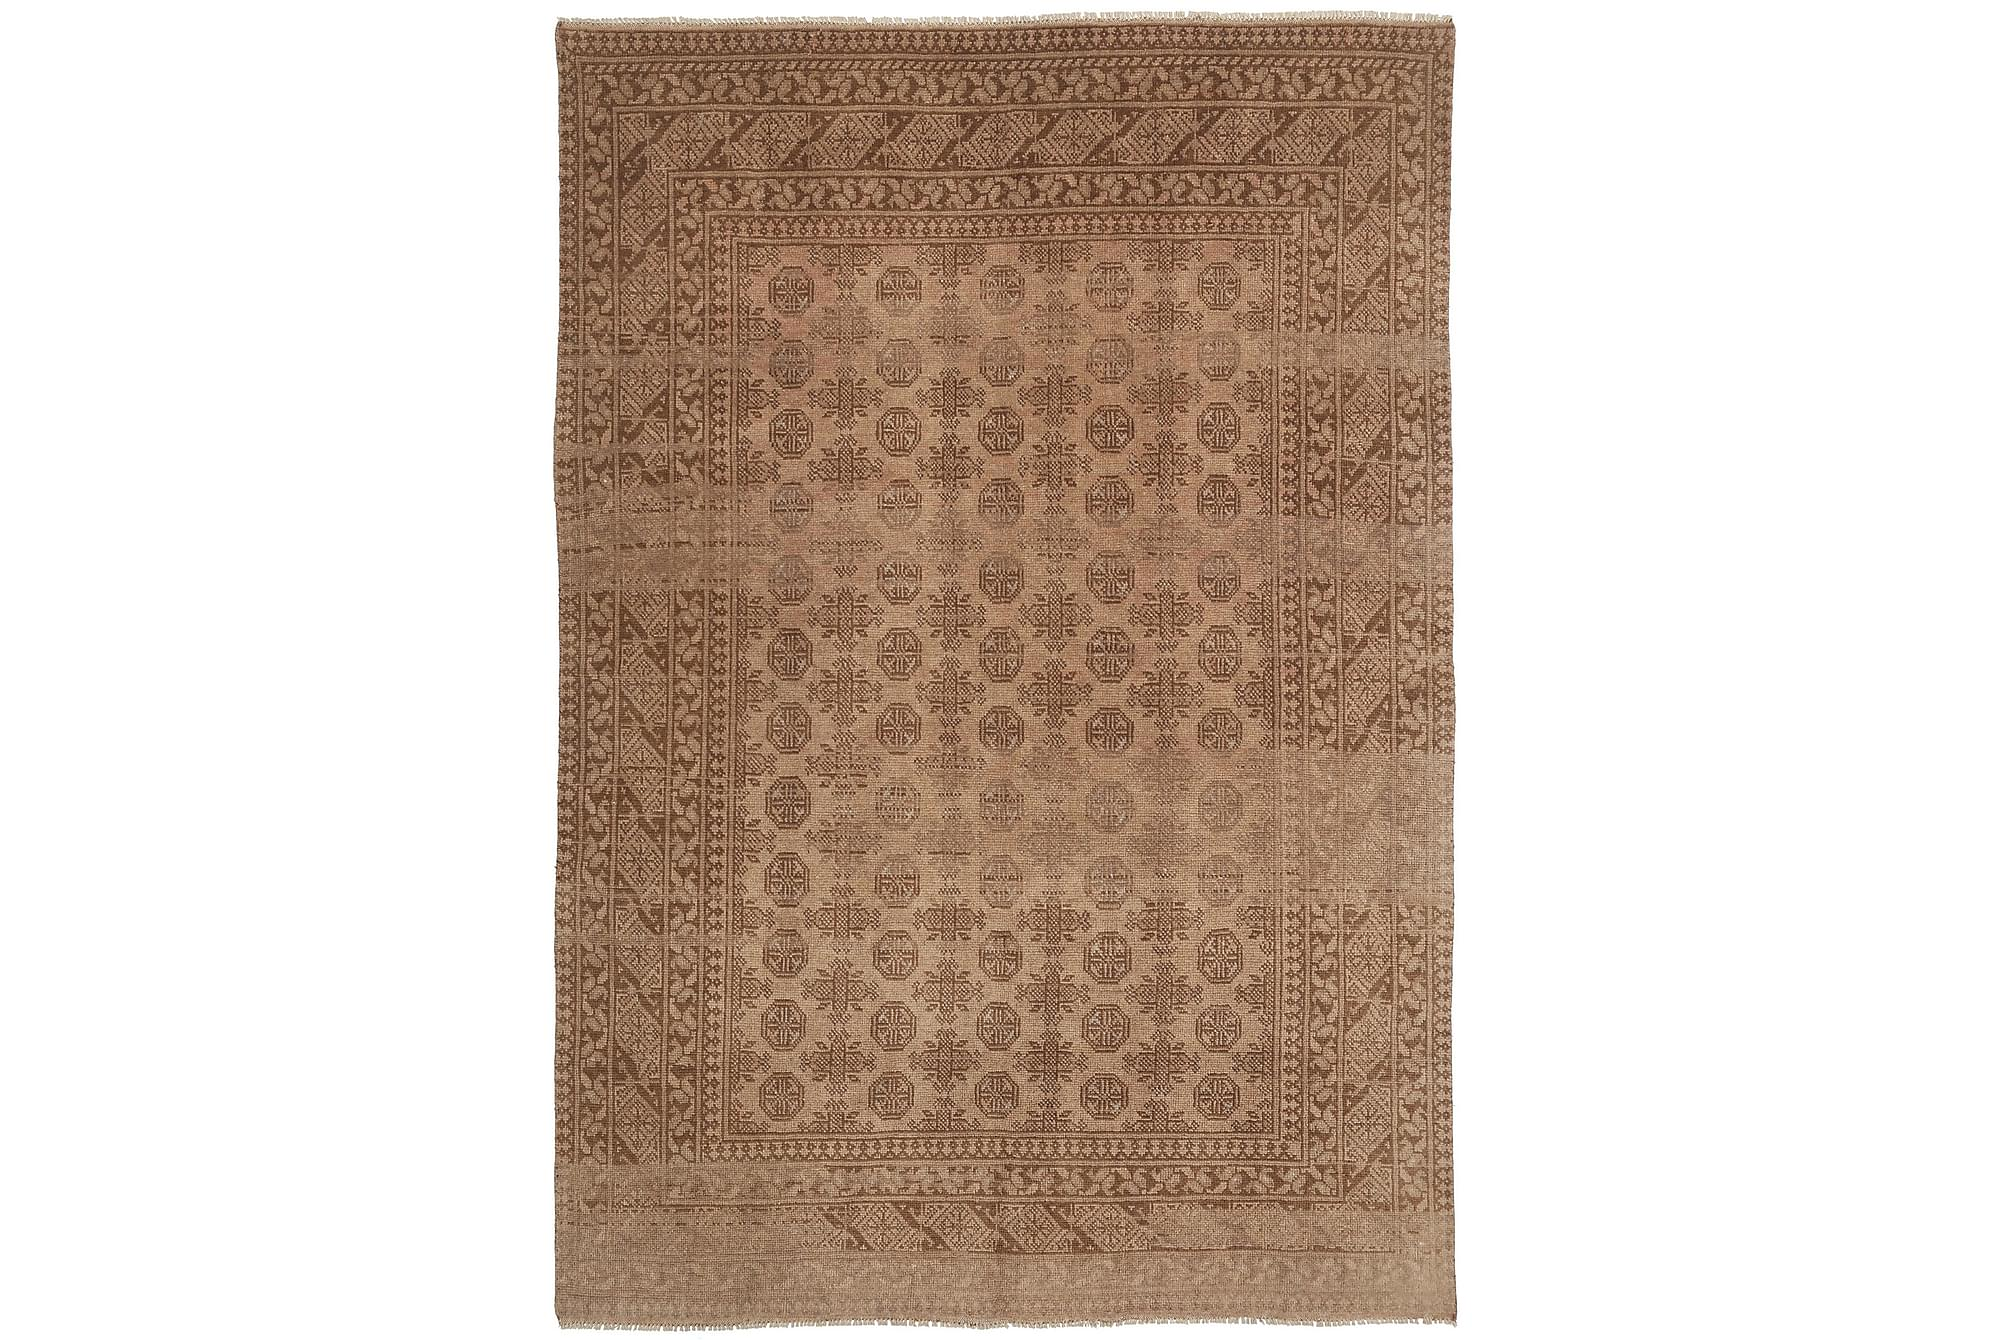 AFGHAN Matta 193x278 Stor Beige/Brun, Orientaliska mattor